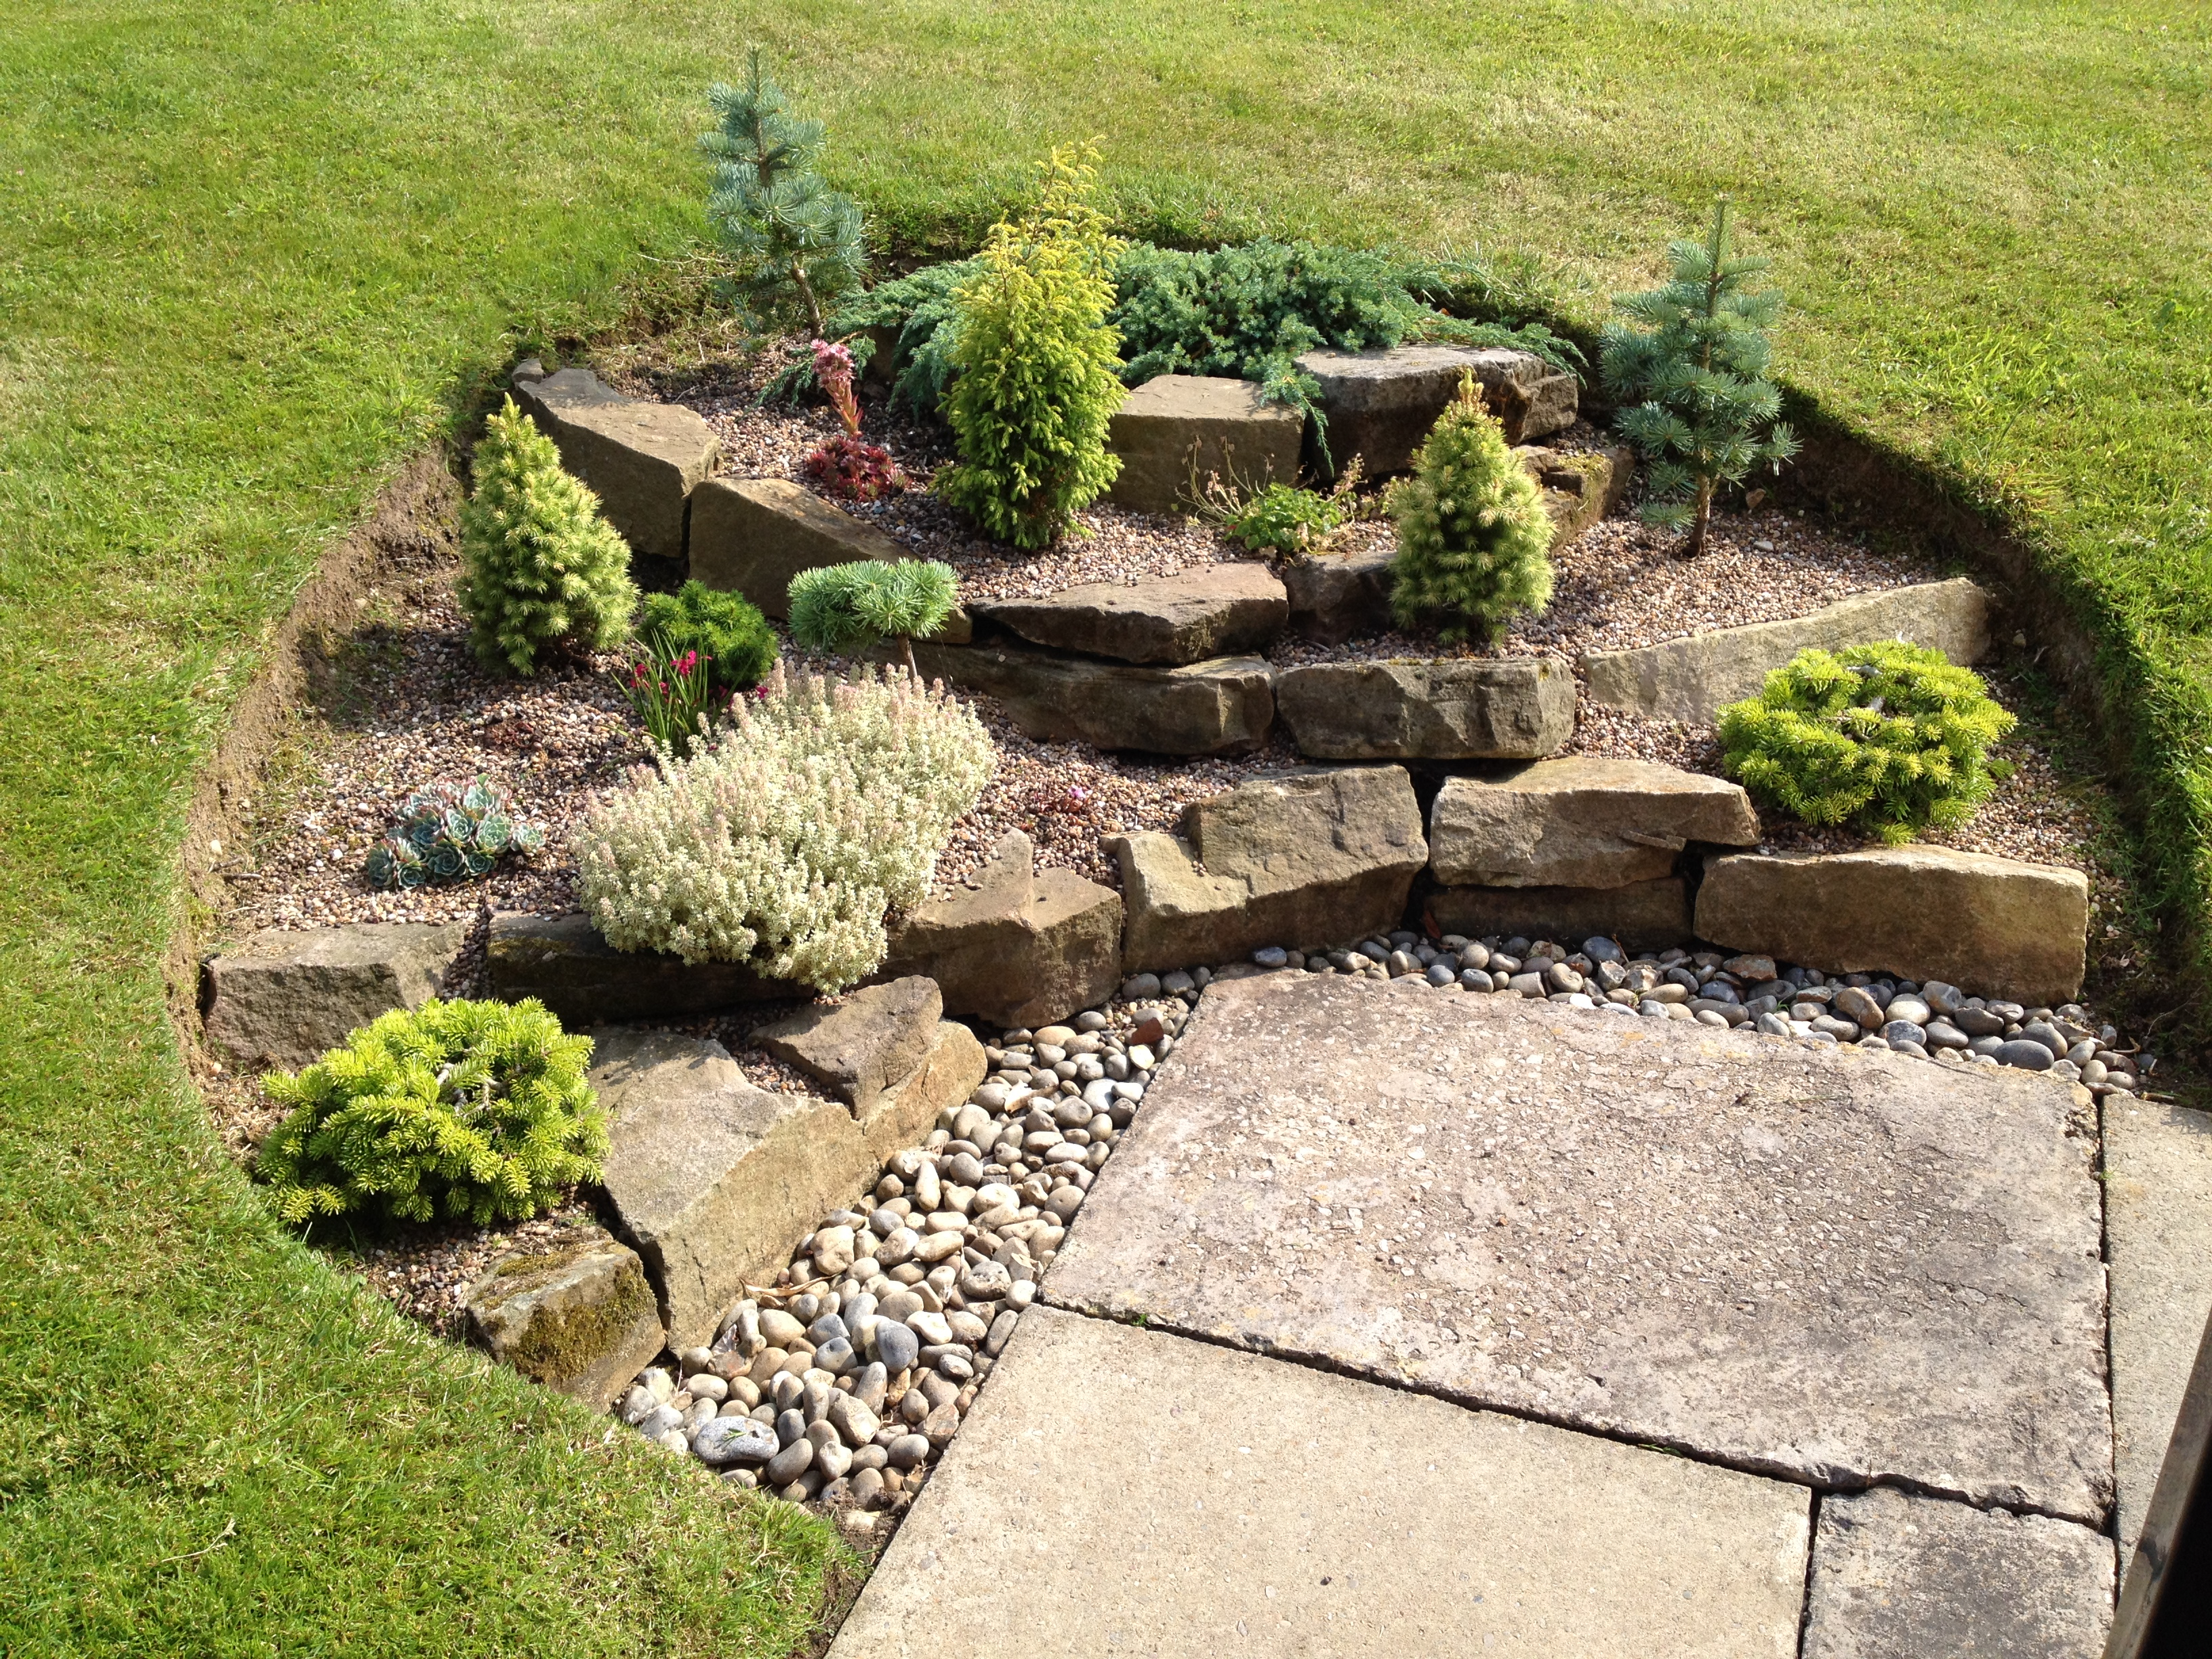 15 Garden Landscaping Ideas | Love The Garden on Landscape Garden Designs For Small Gardens id=57204